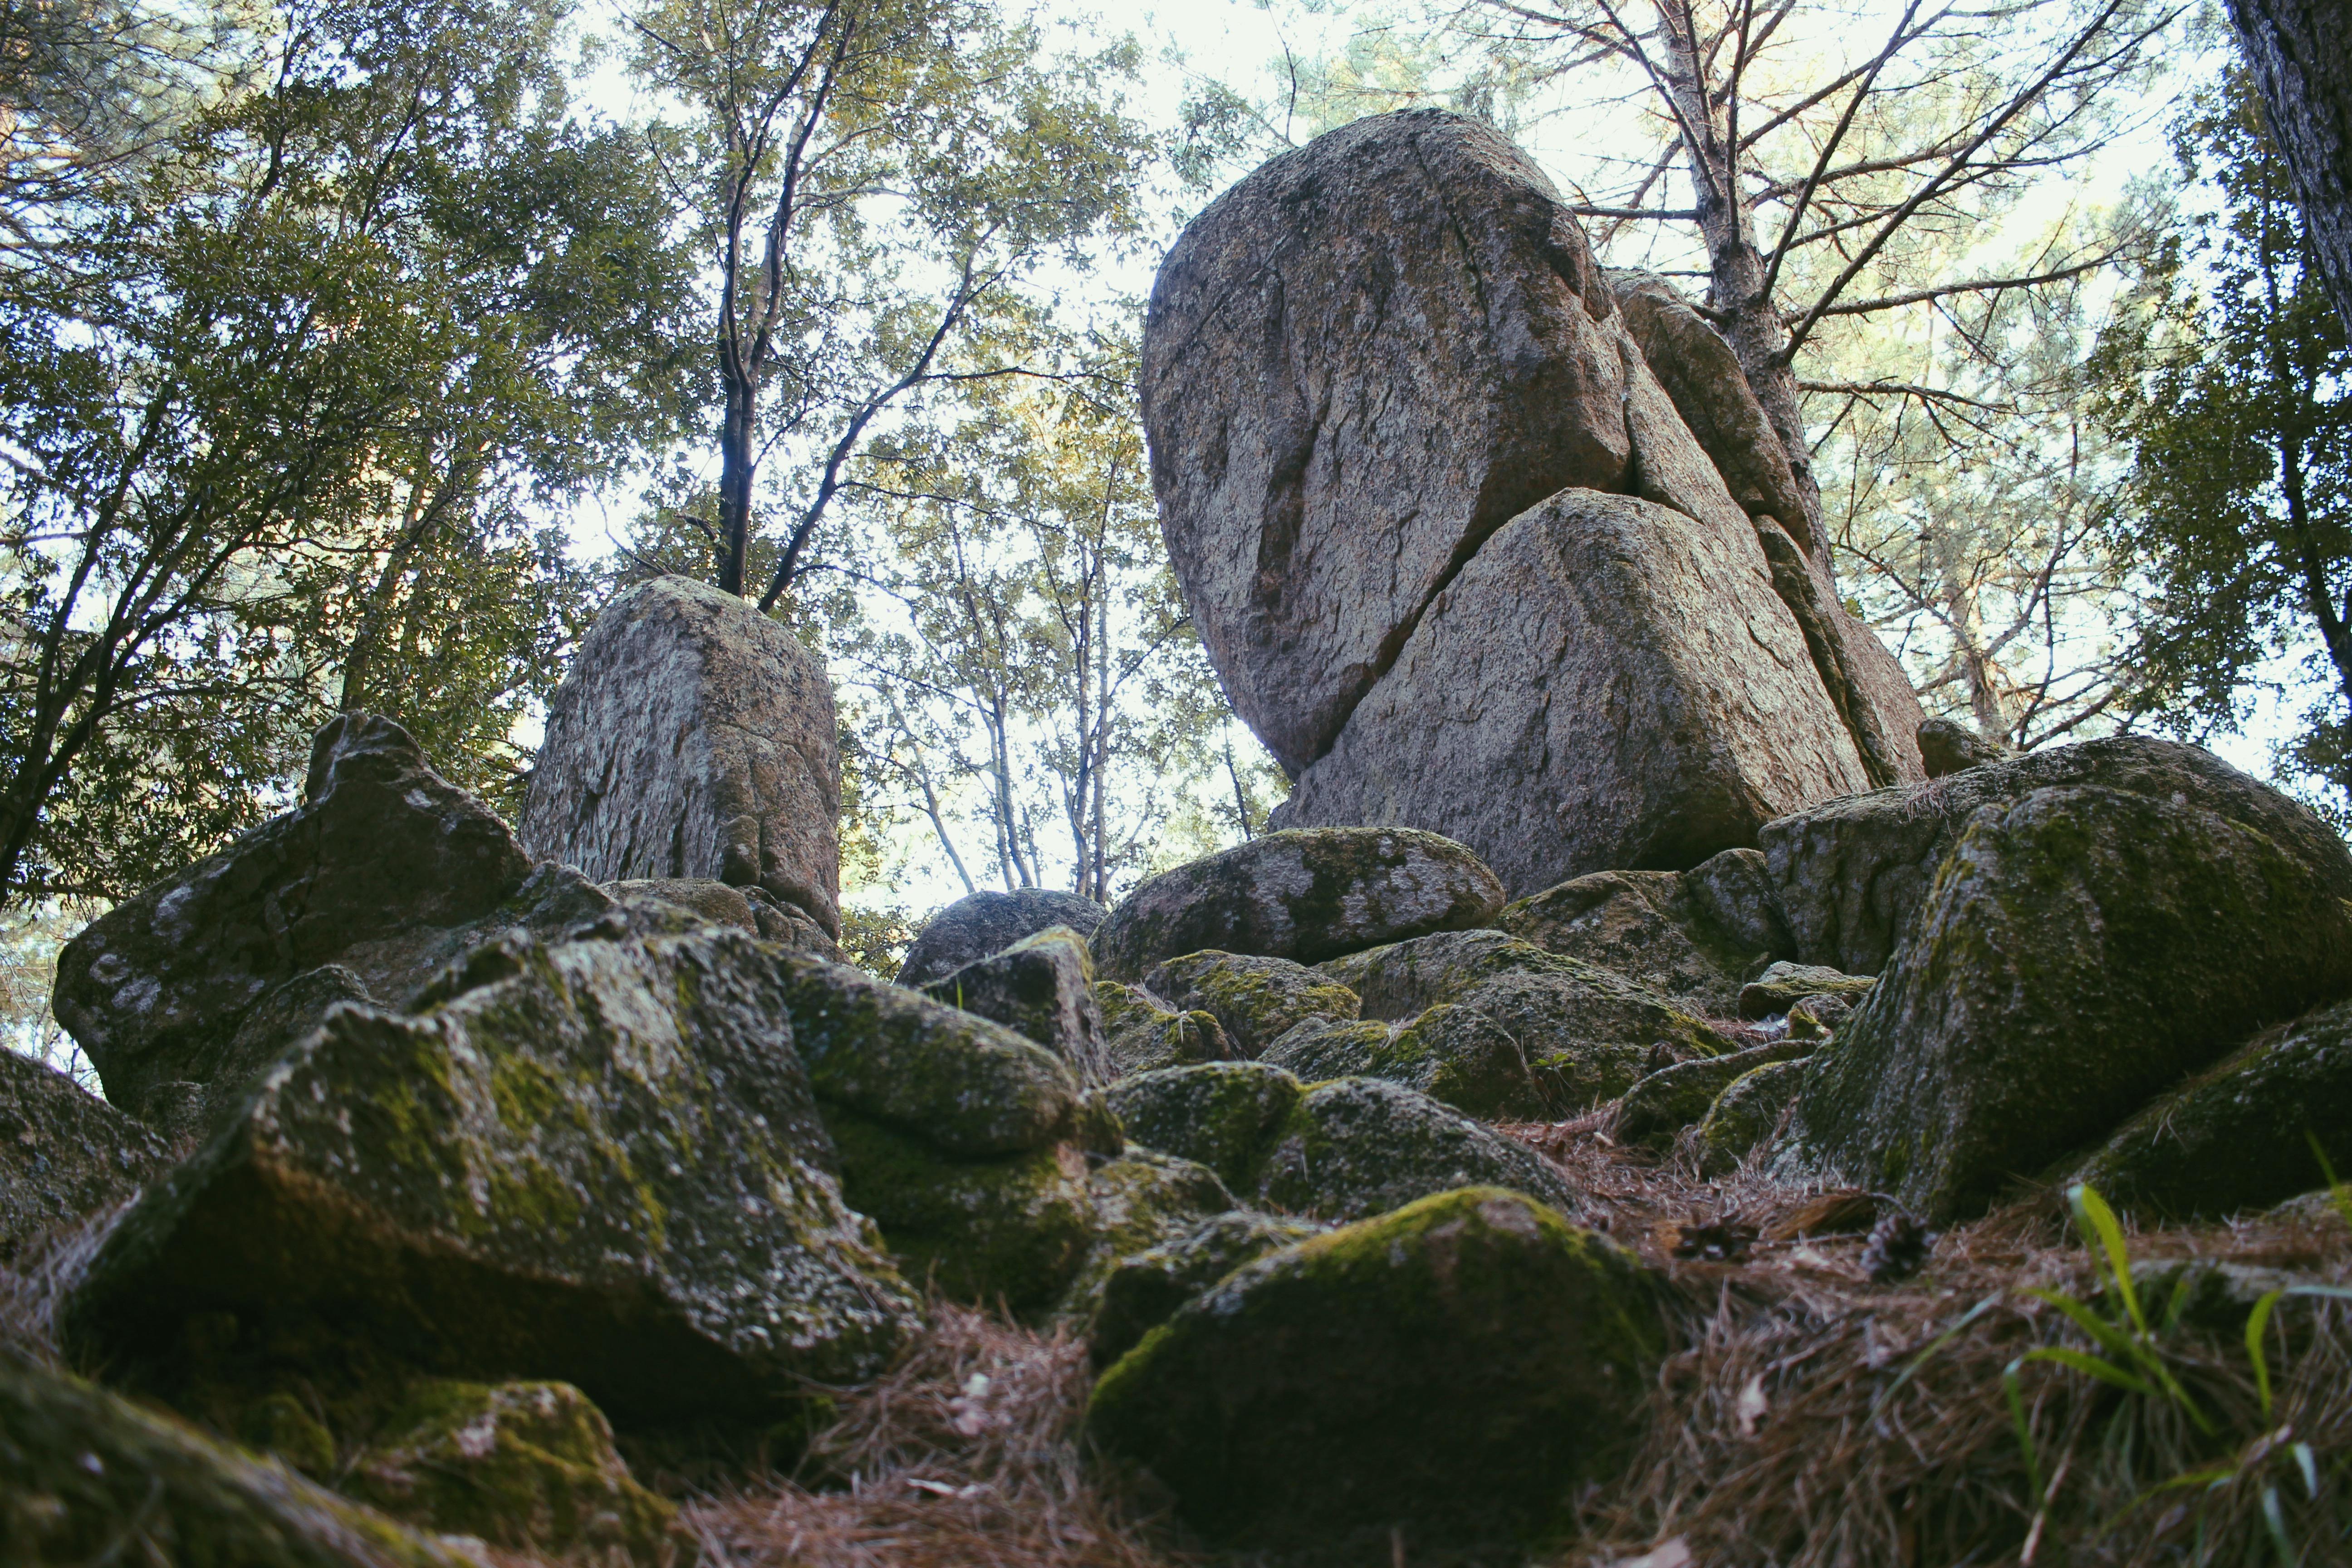 I Megaliti di Nardodipace (VV) o di quanto è immensa l'umanità